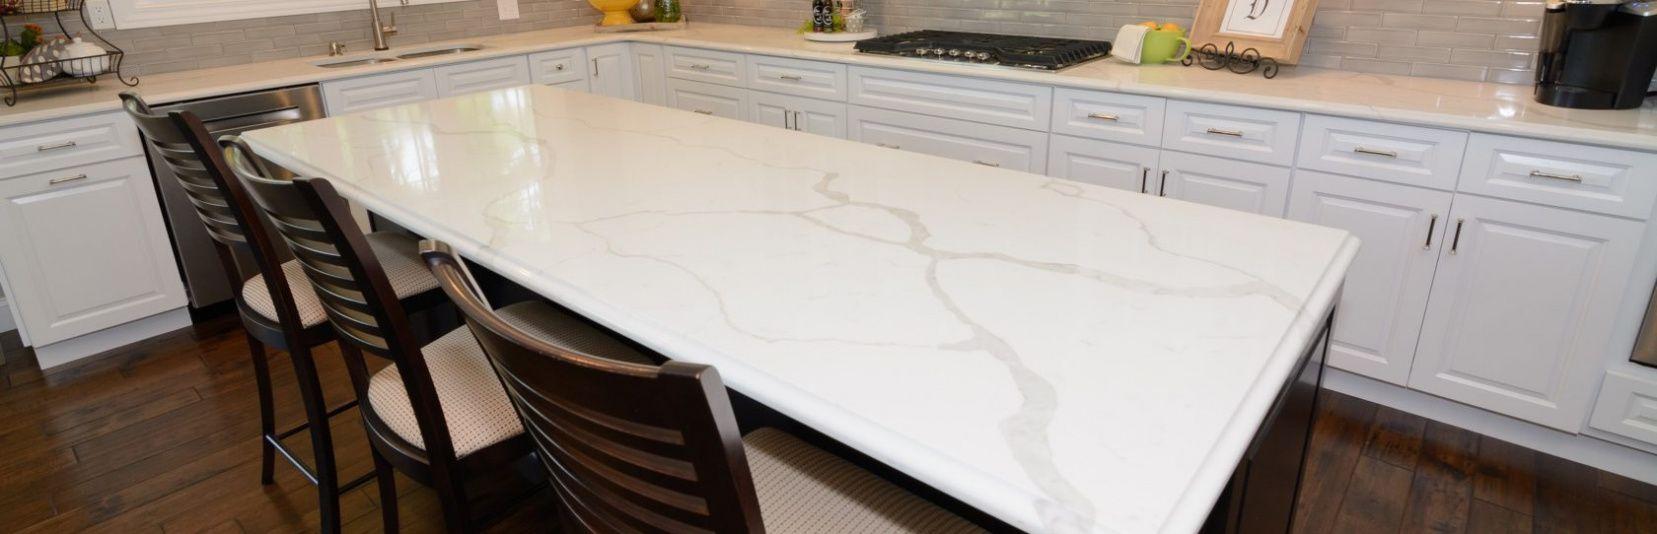 50+ Quartz Countertop Installers   Backsplash For Kitchen Ideas Check More  At Http:/